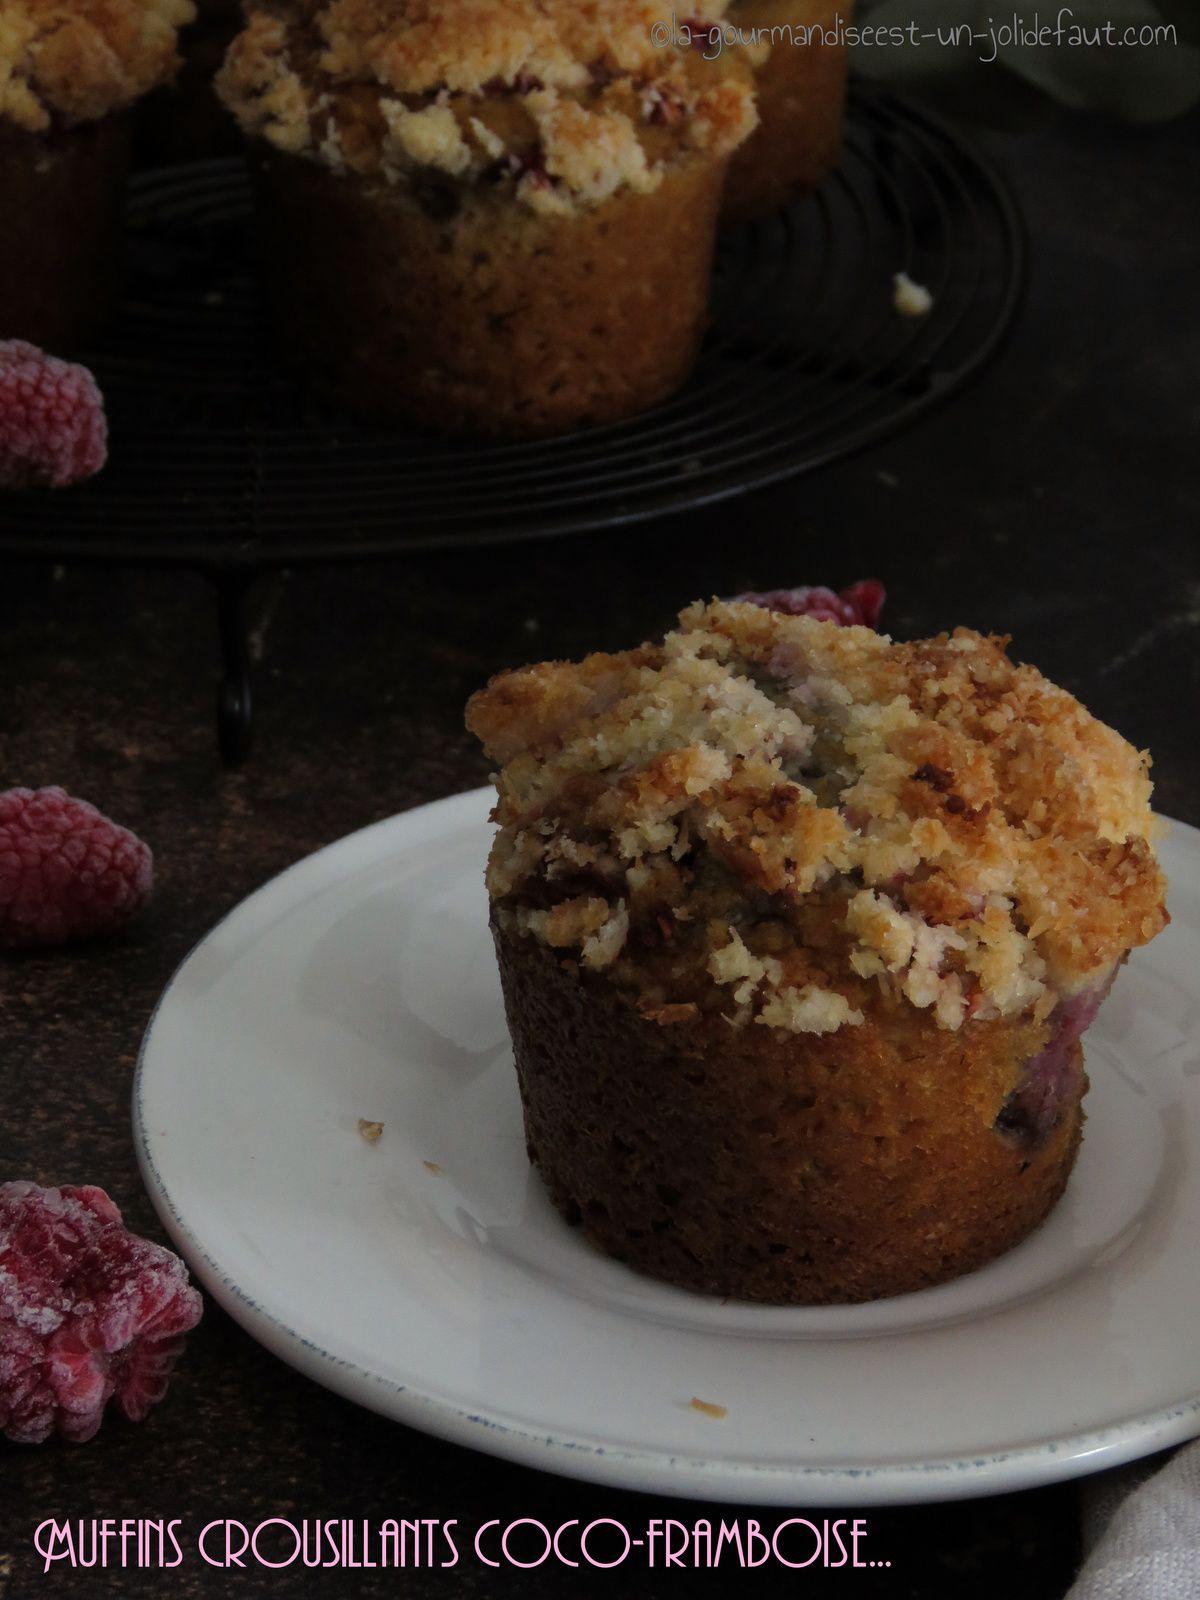 Muffins croustillants coco-framboise